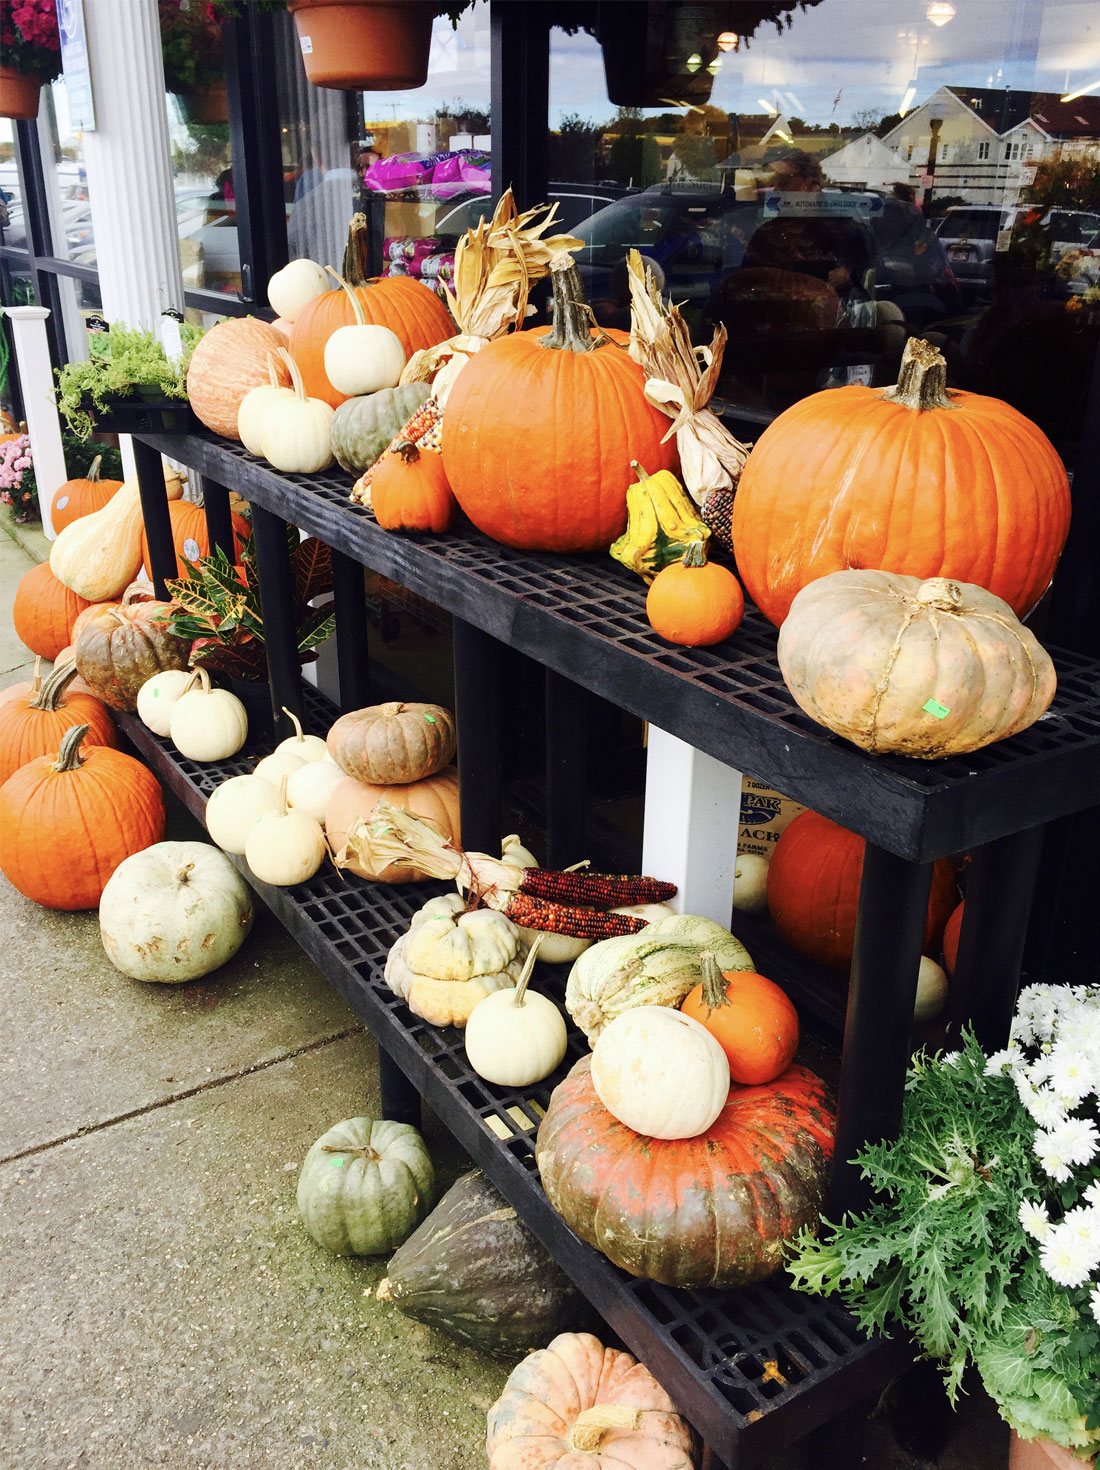 Pumpkins & Gourds at Ring Bros. | Brewster By the Sea Cape Cod Inn | Brewster, MA